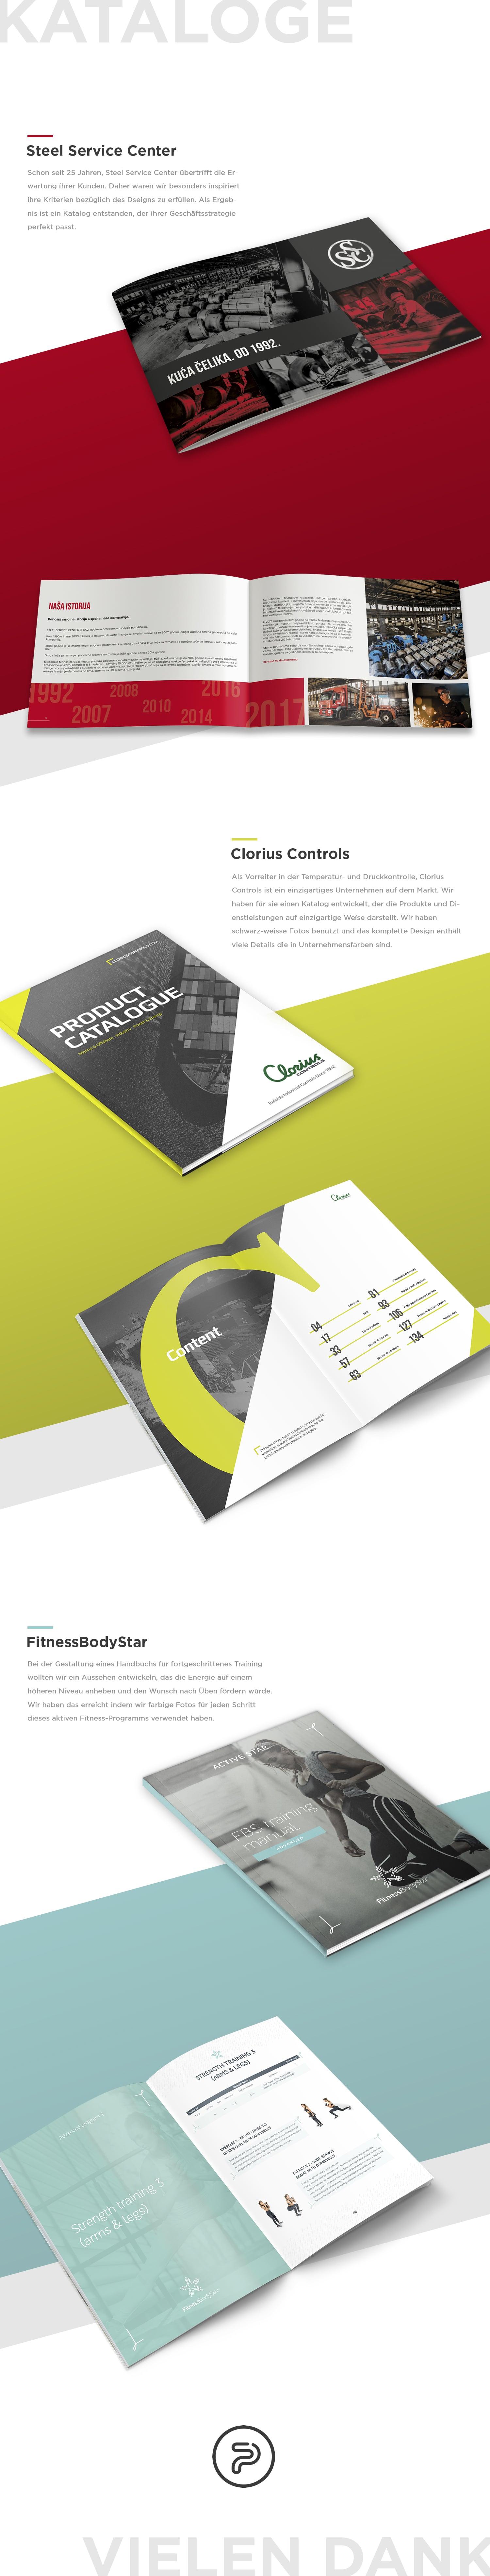 Katalog Design Eines Porfolios